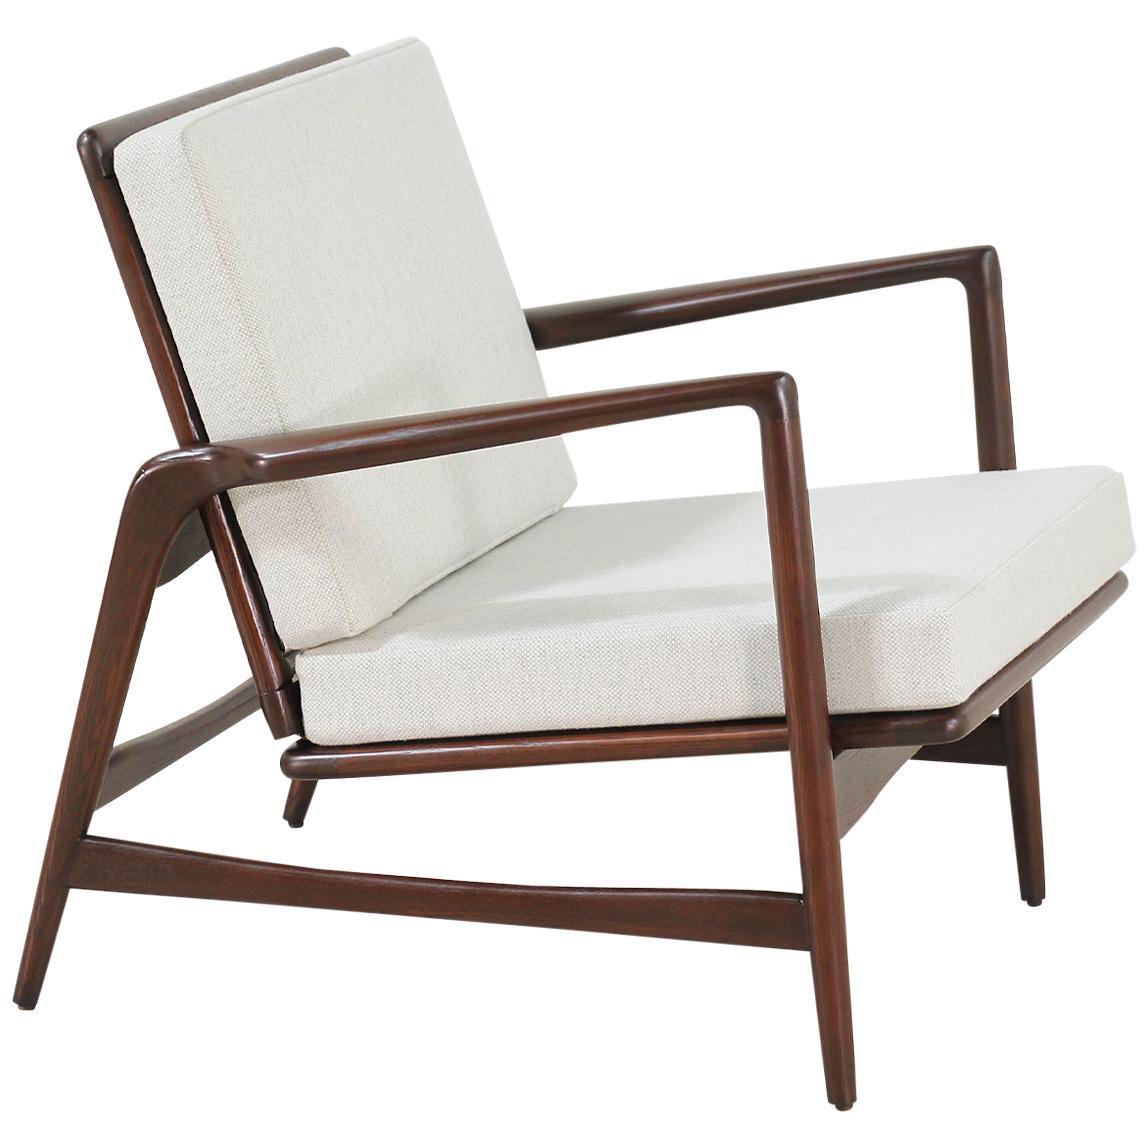 Ib Kofod-Larsen Reclining Lounge Chair for Selig